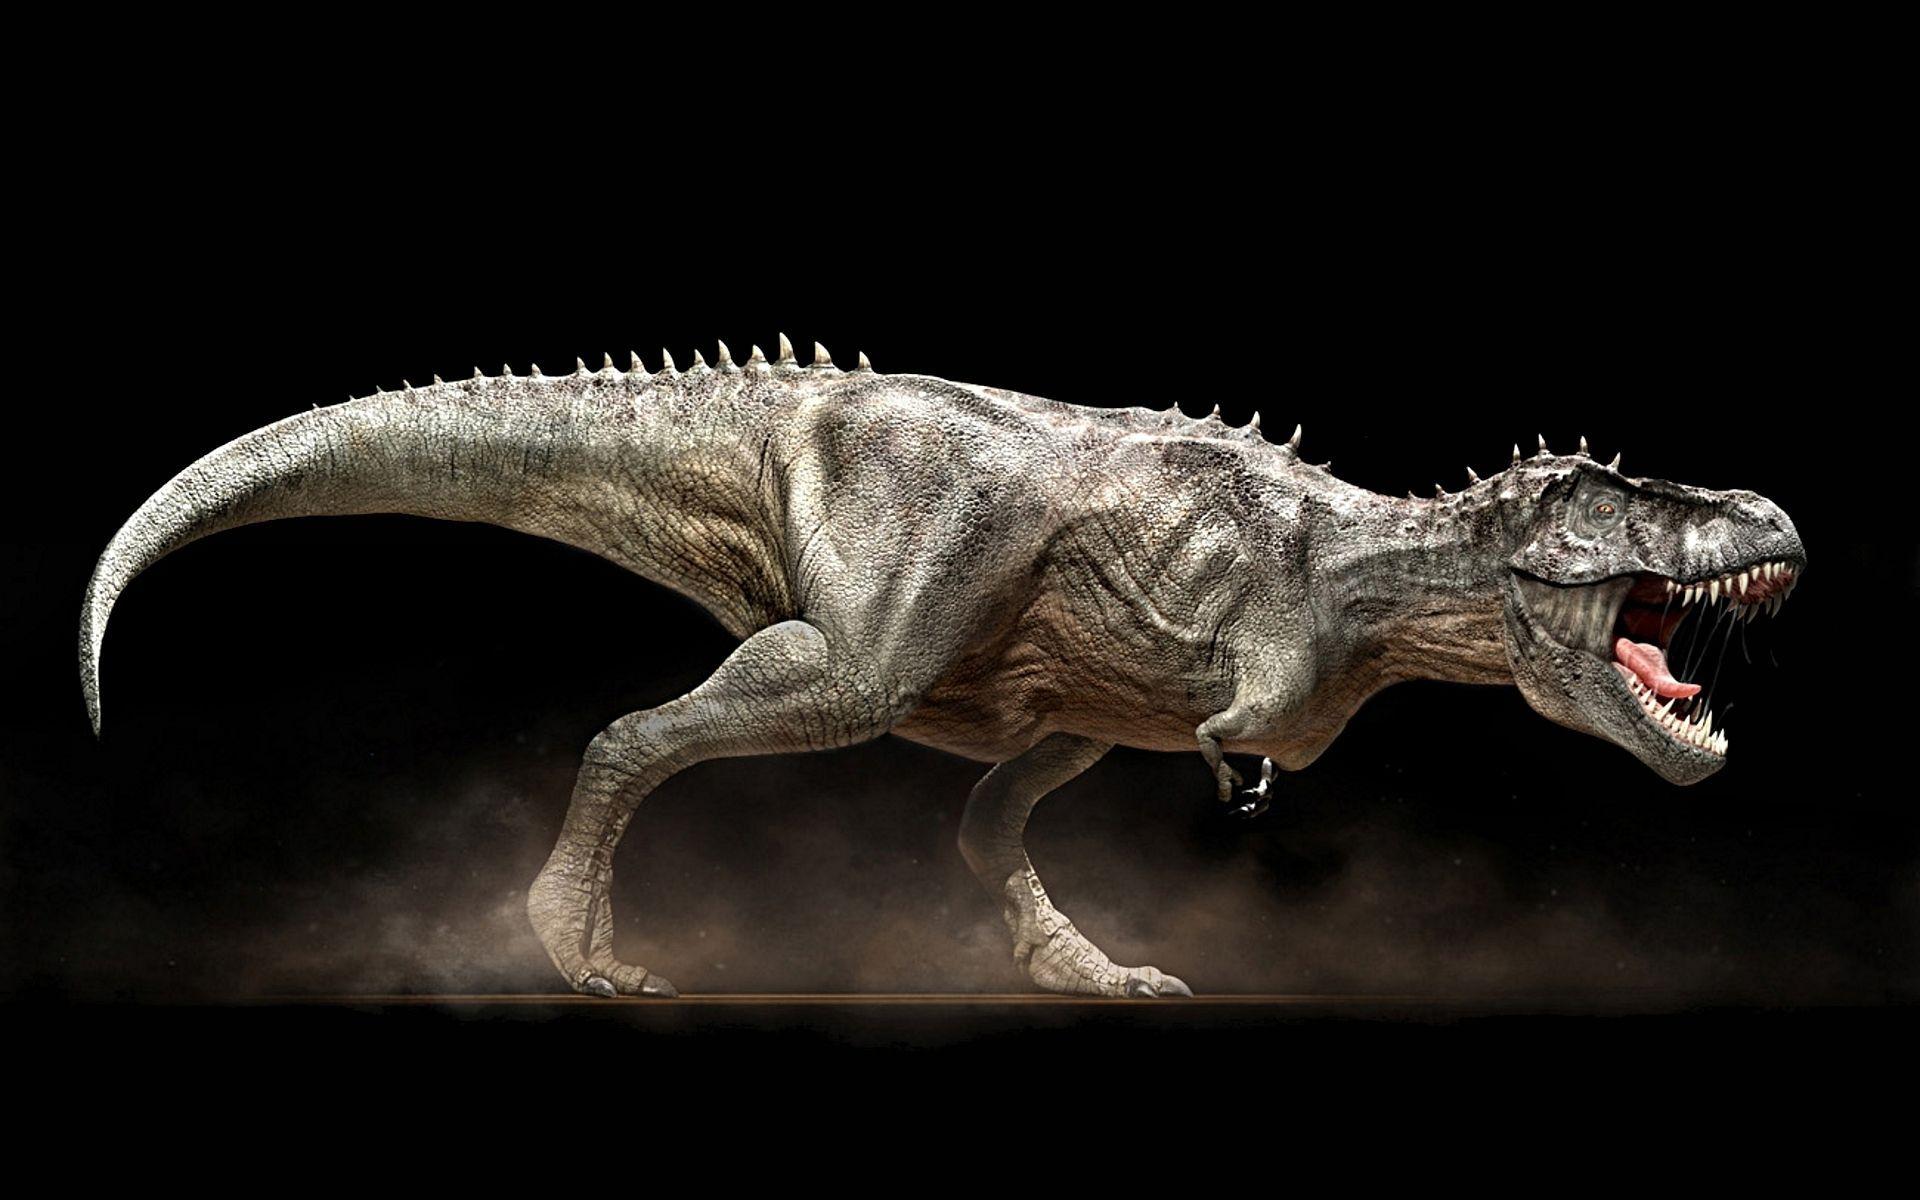 Big Dinosaur Wallpapers Hd Resolution ...